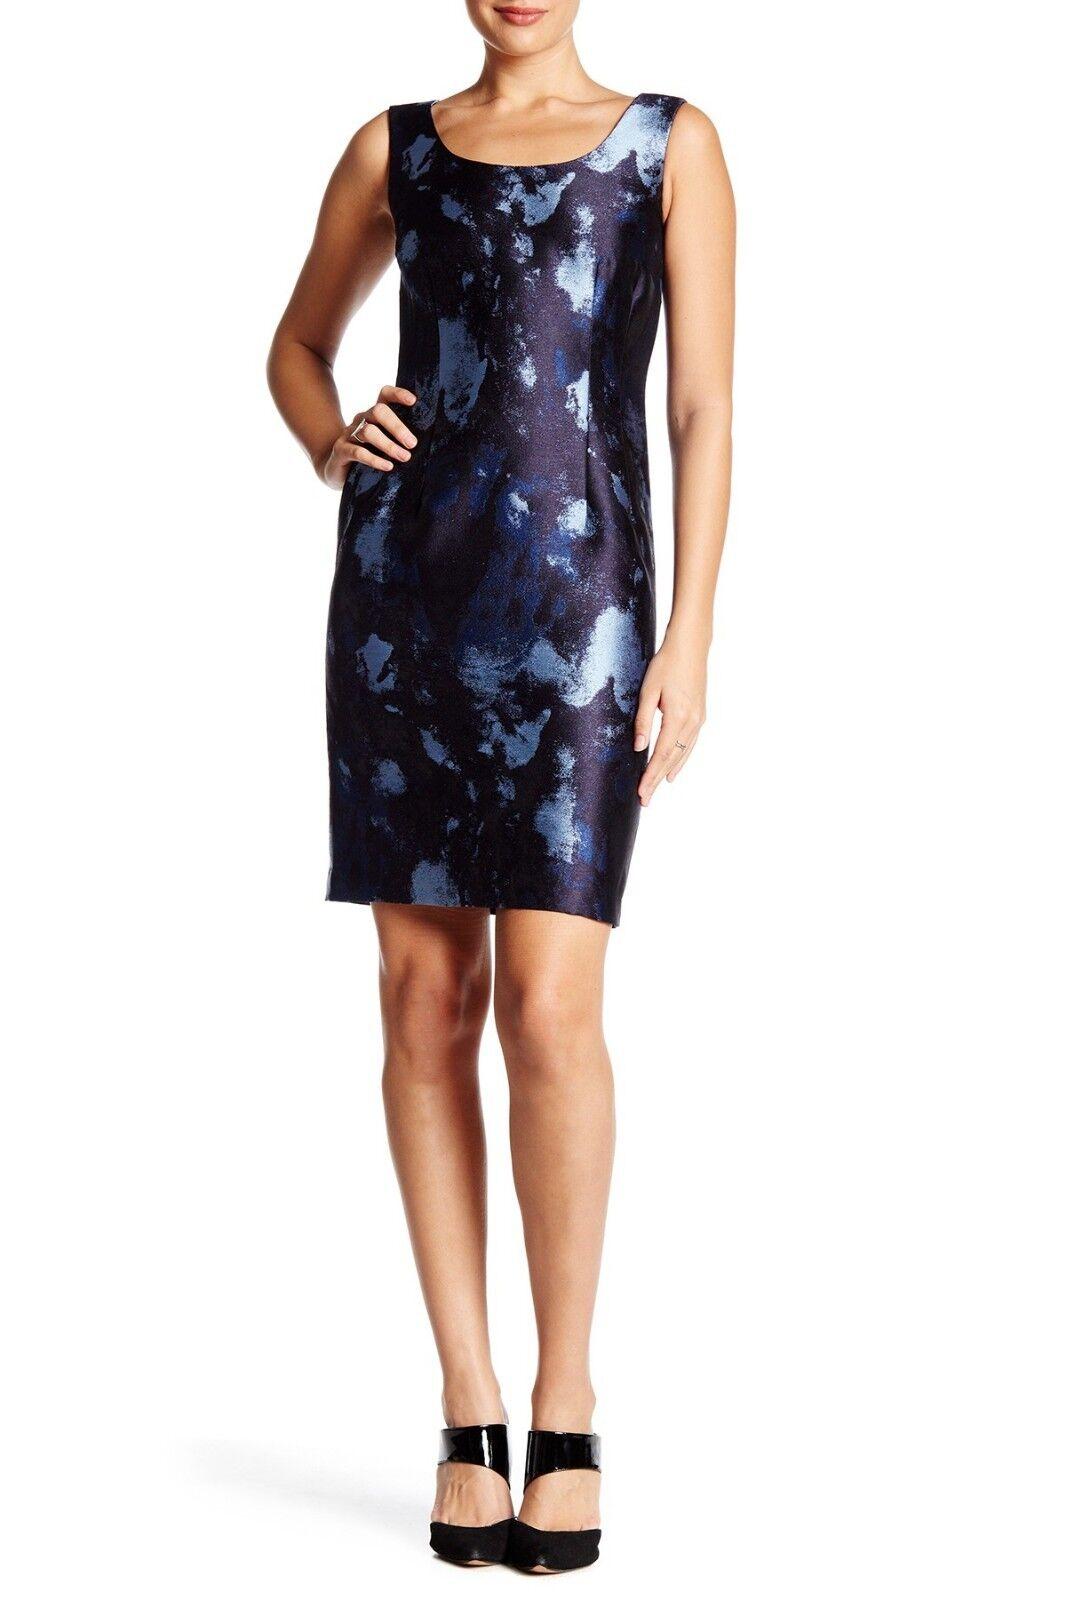 9d0ba8d059e03 LAFAYETTE 148 Rebecca Ink Multi Sleeveless Dress Size NWT 6 ...